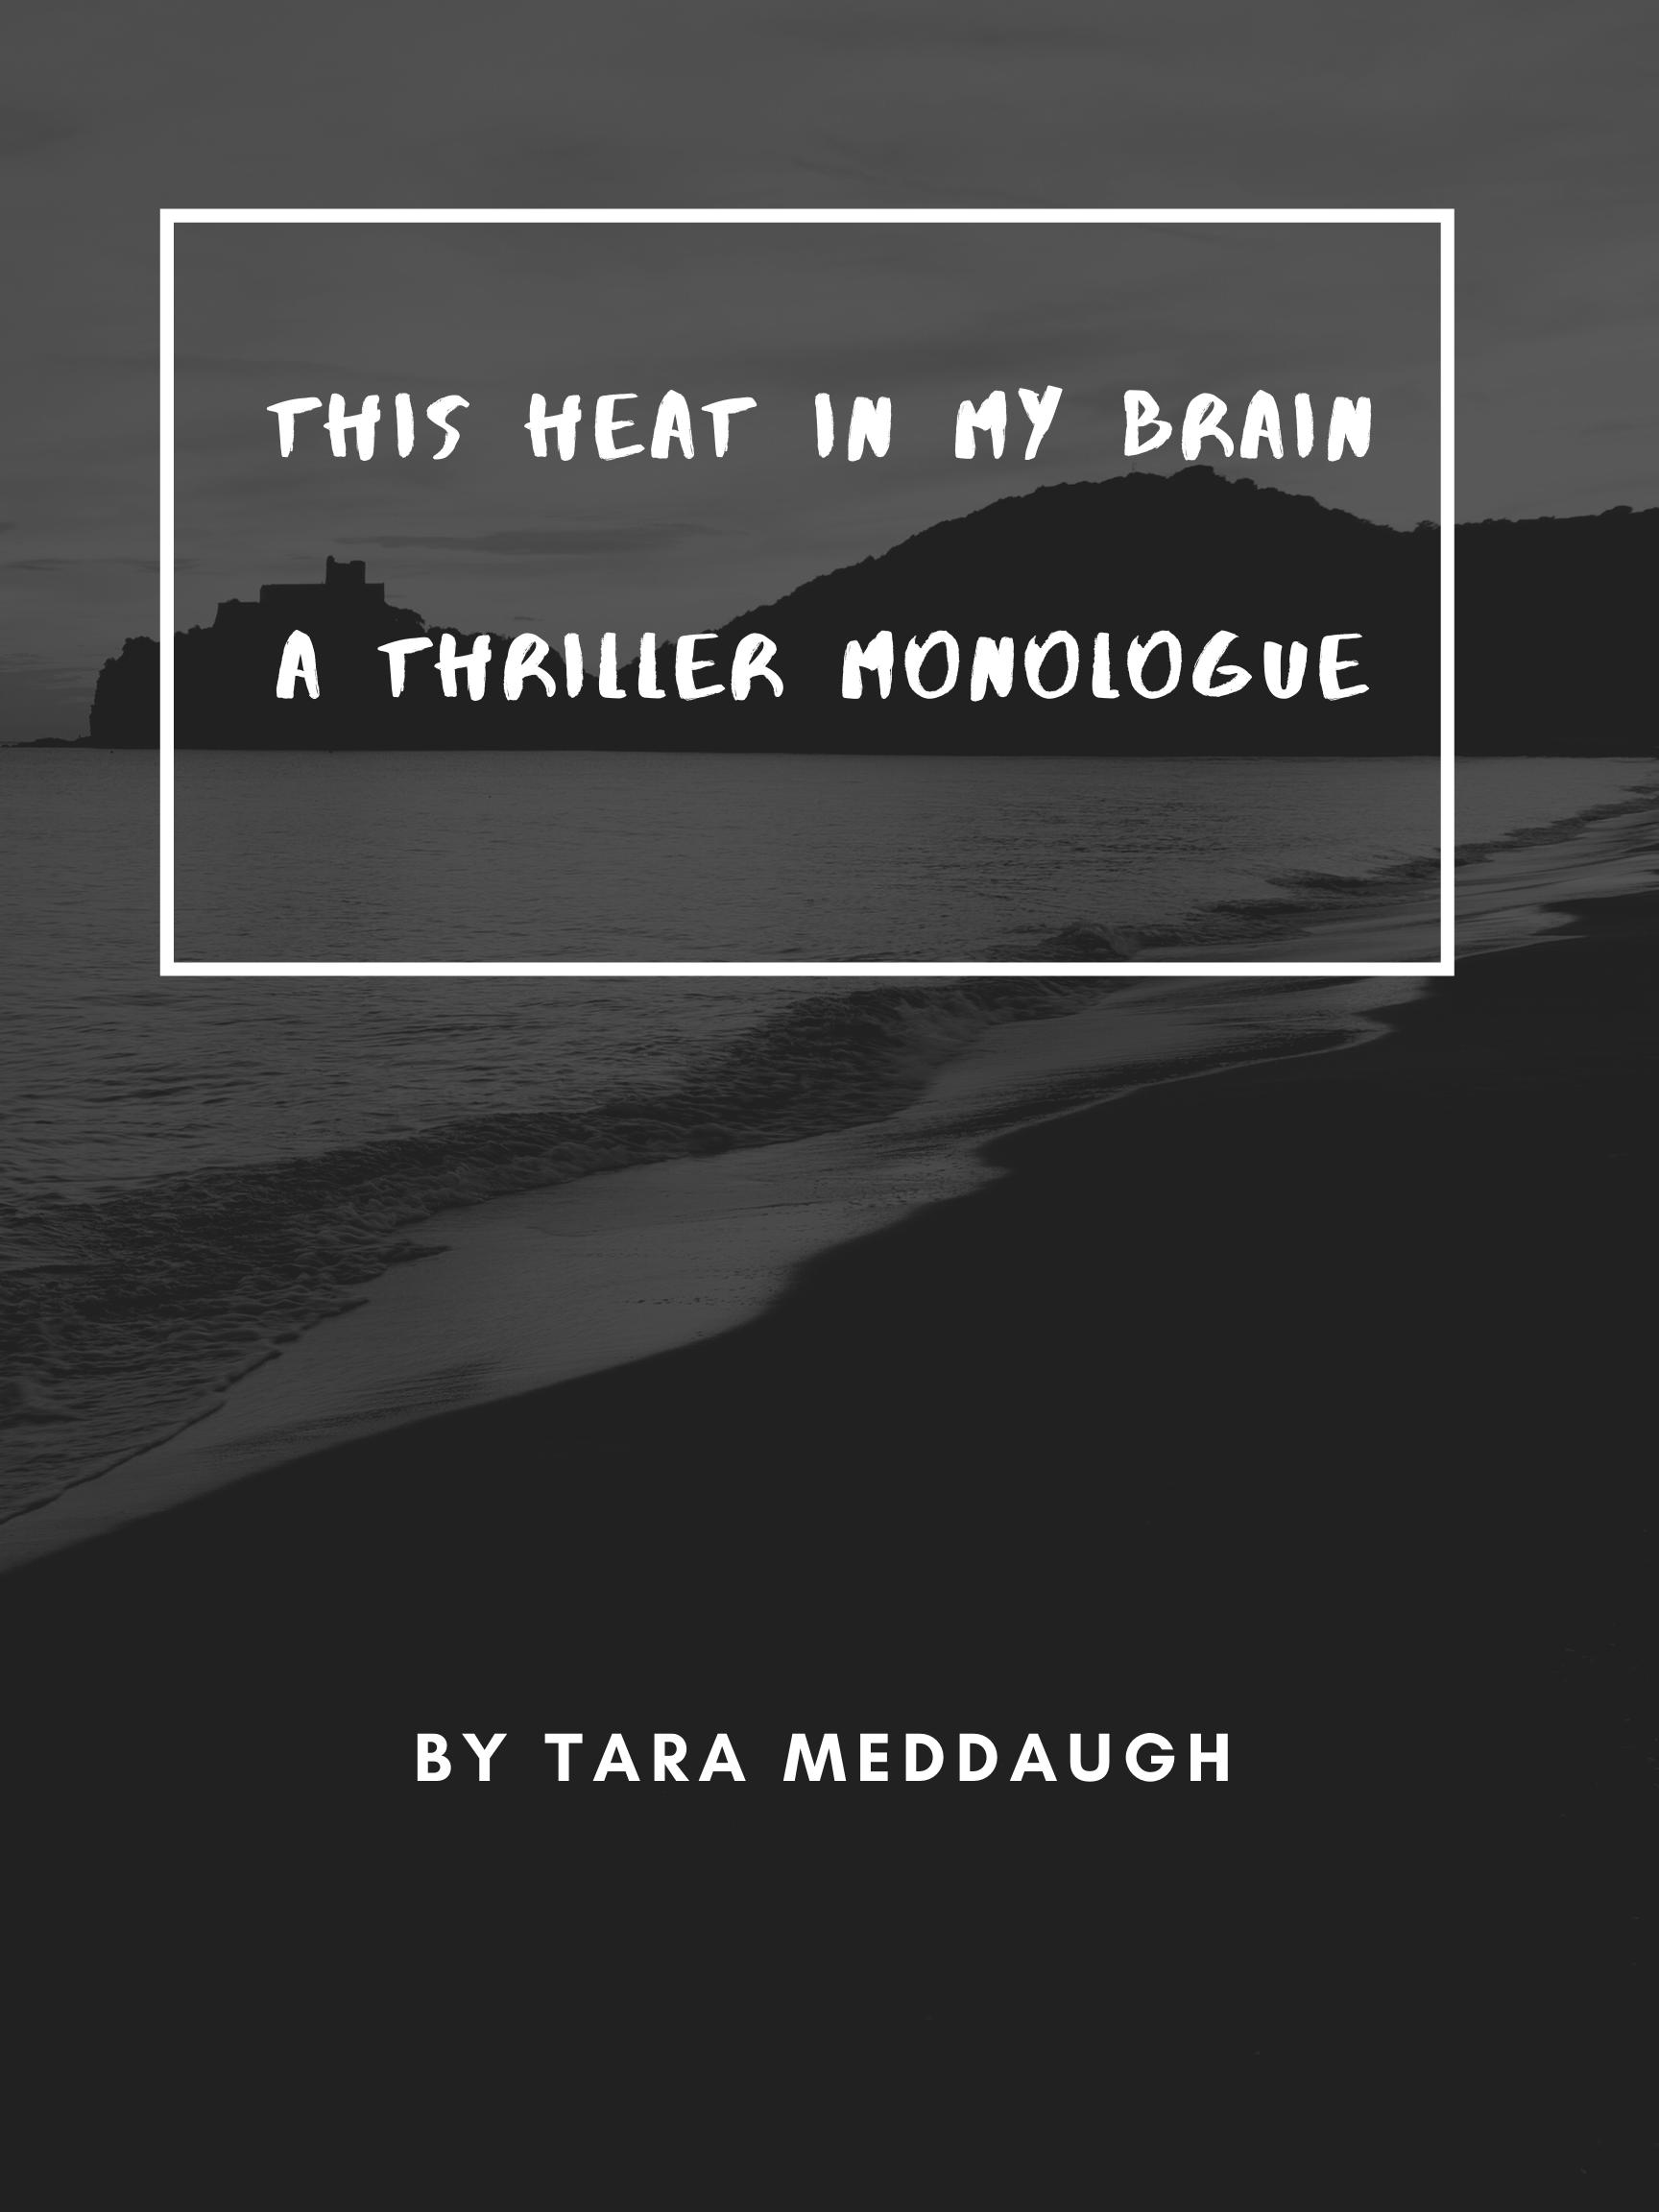 This Heat in my brain by Tara Meddaugh-1.png